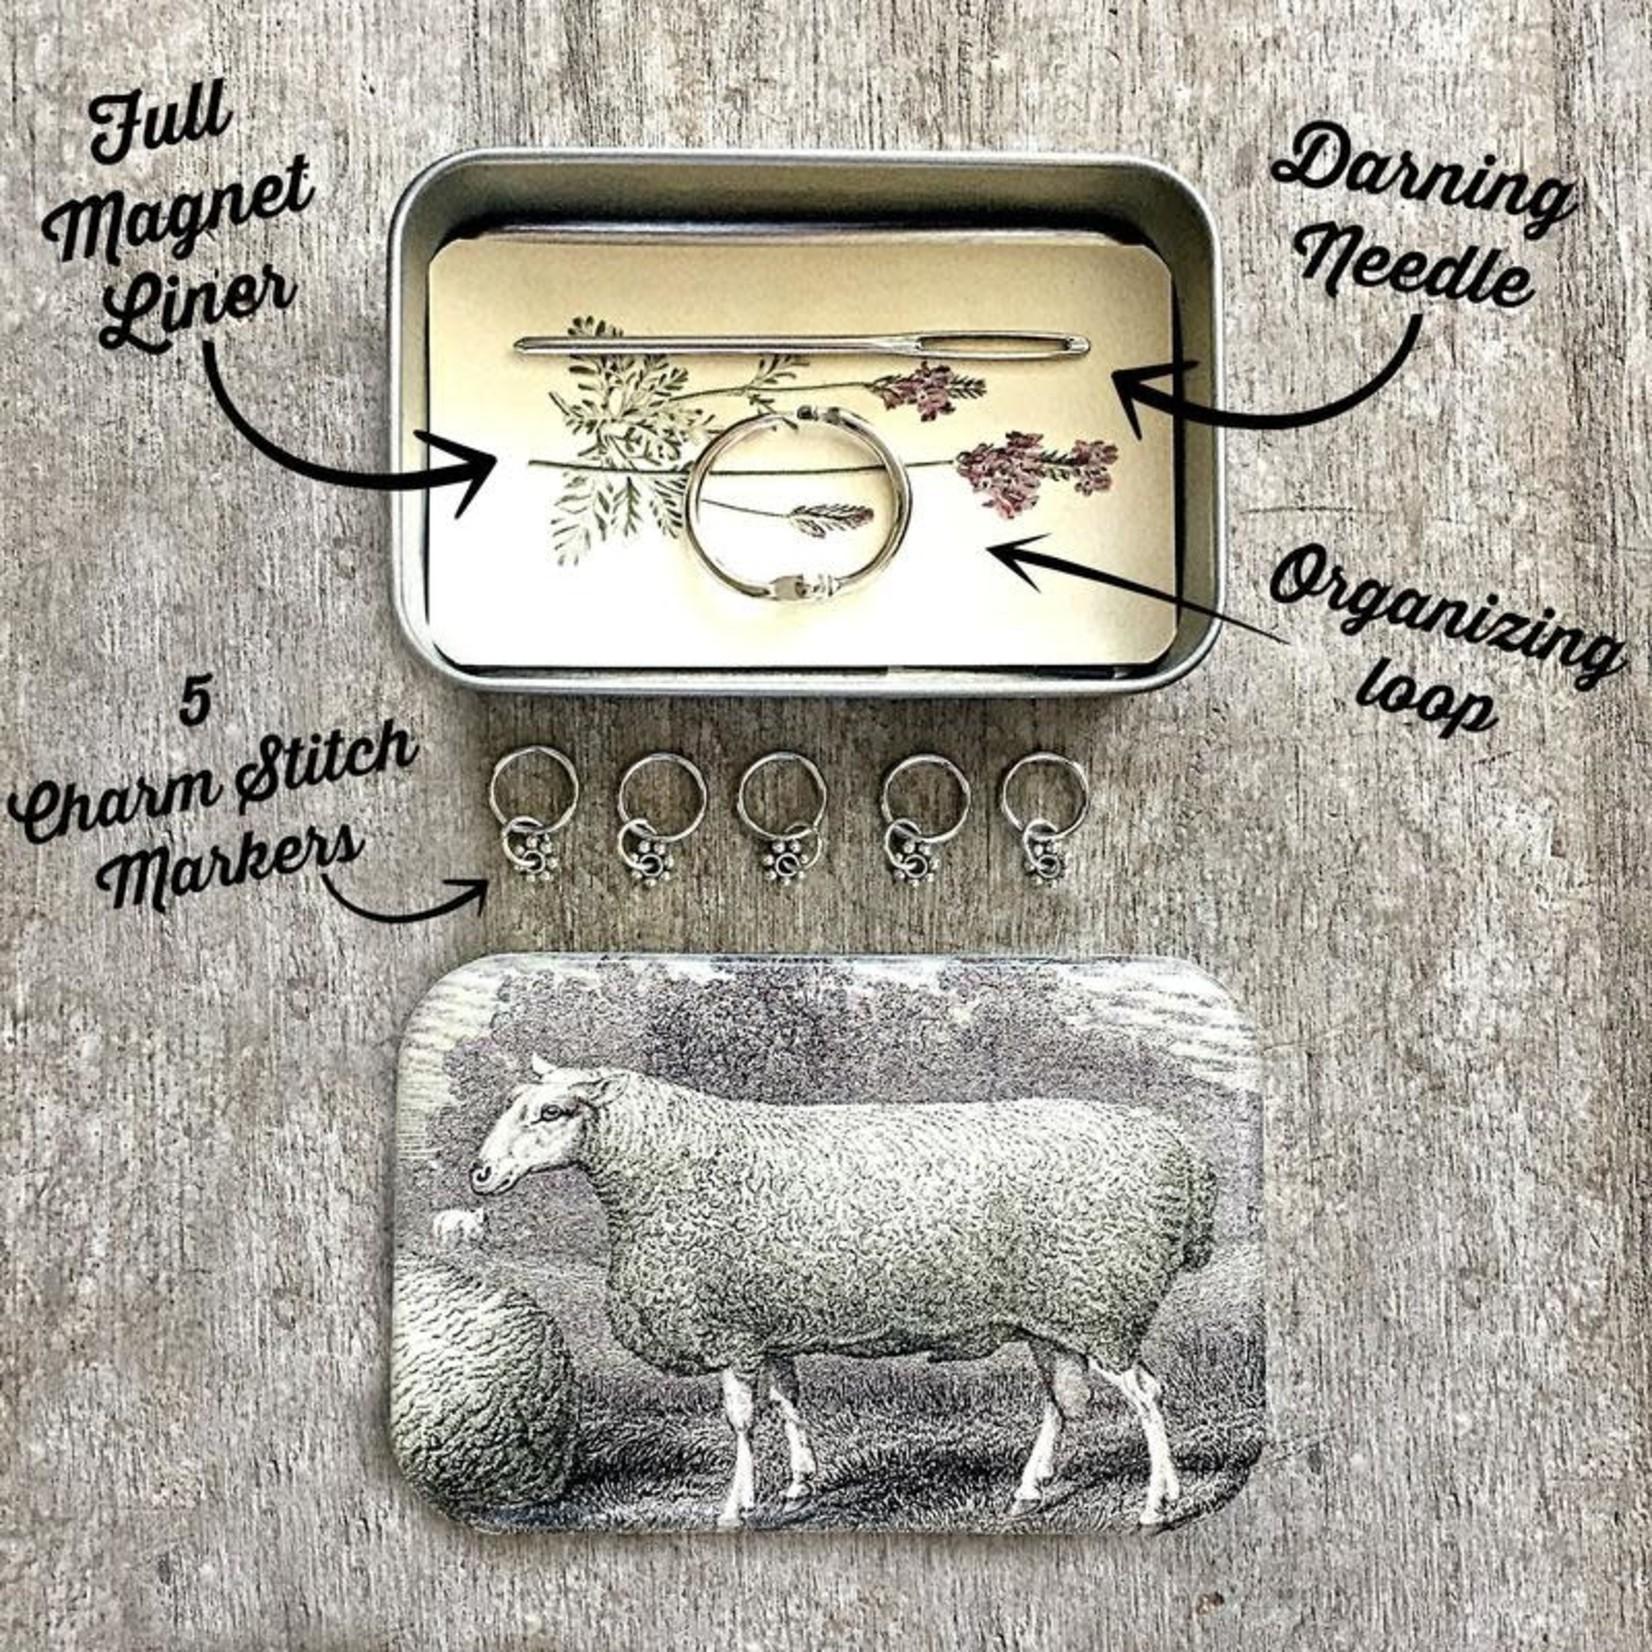 Firefly Notes Sheep Knitting Kit,